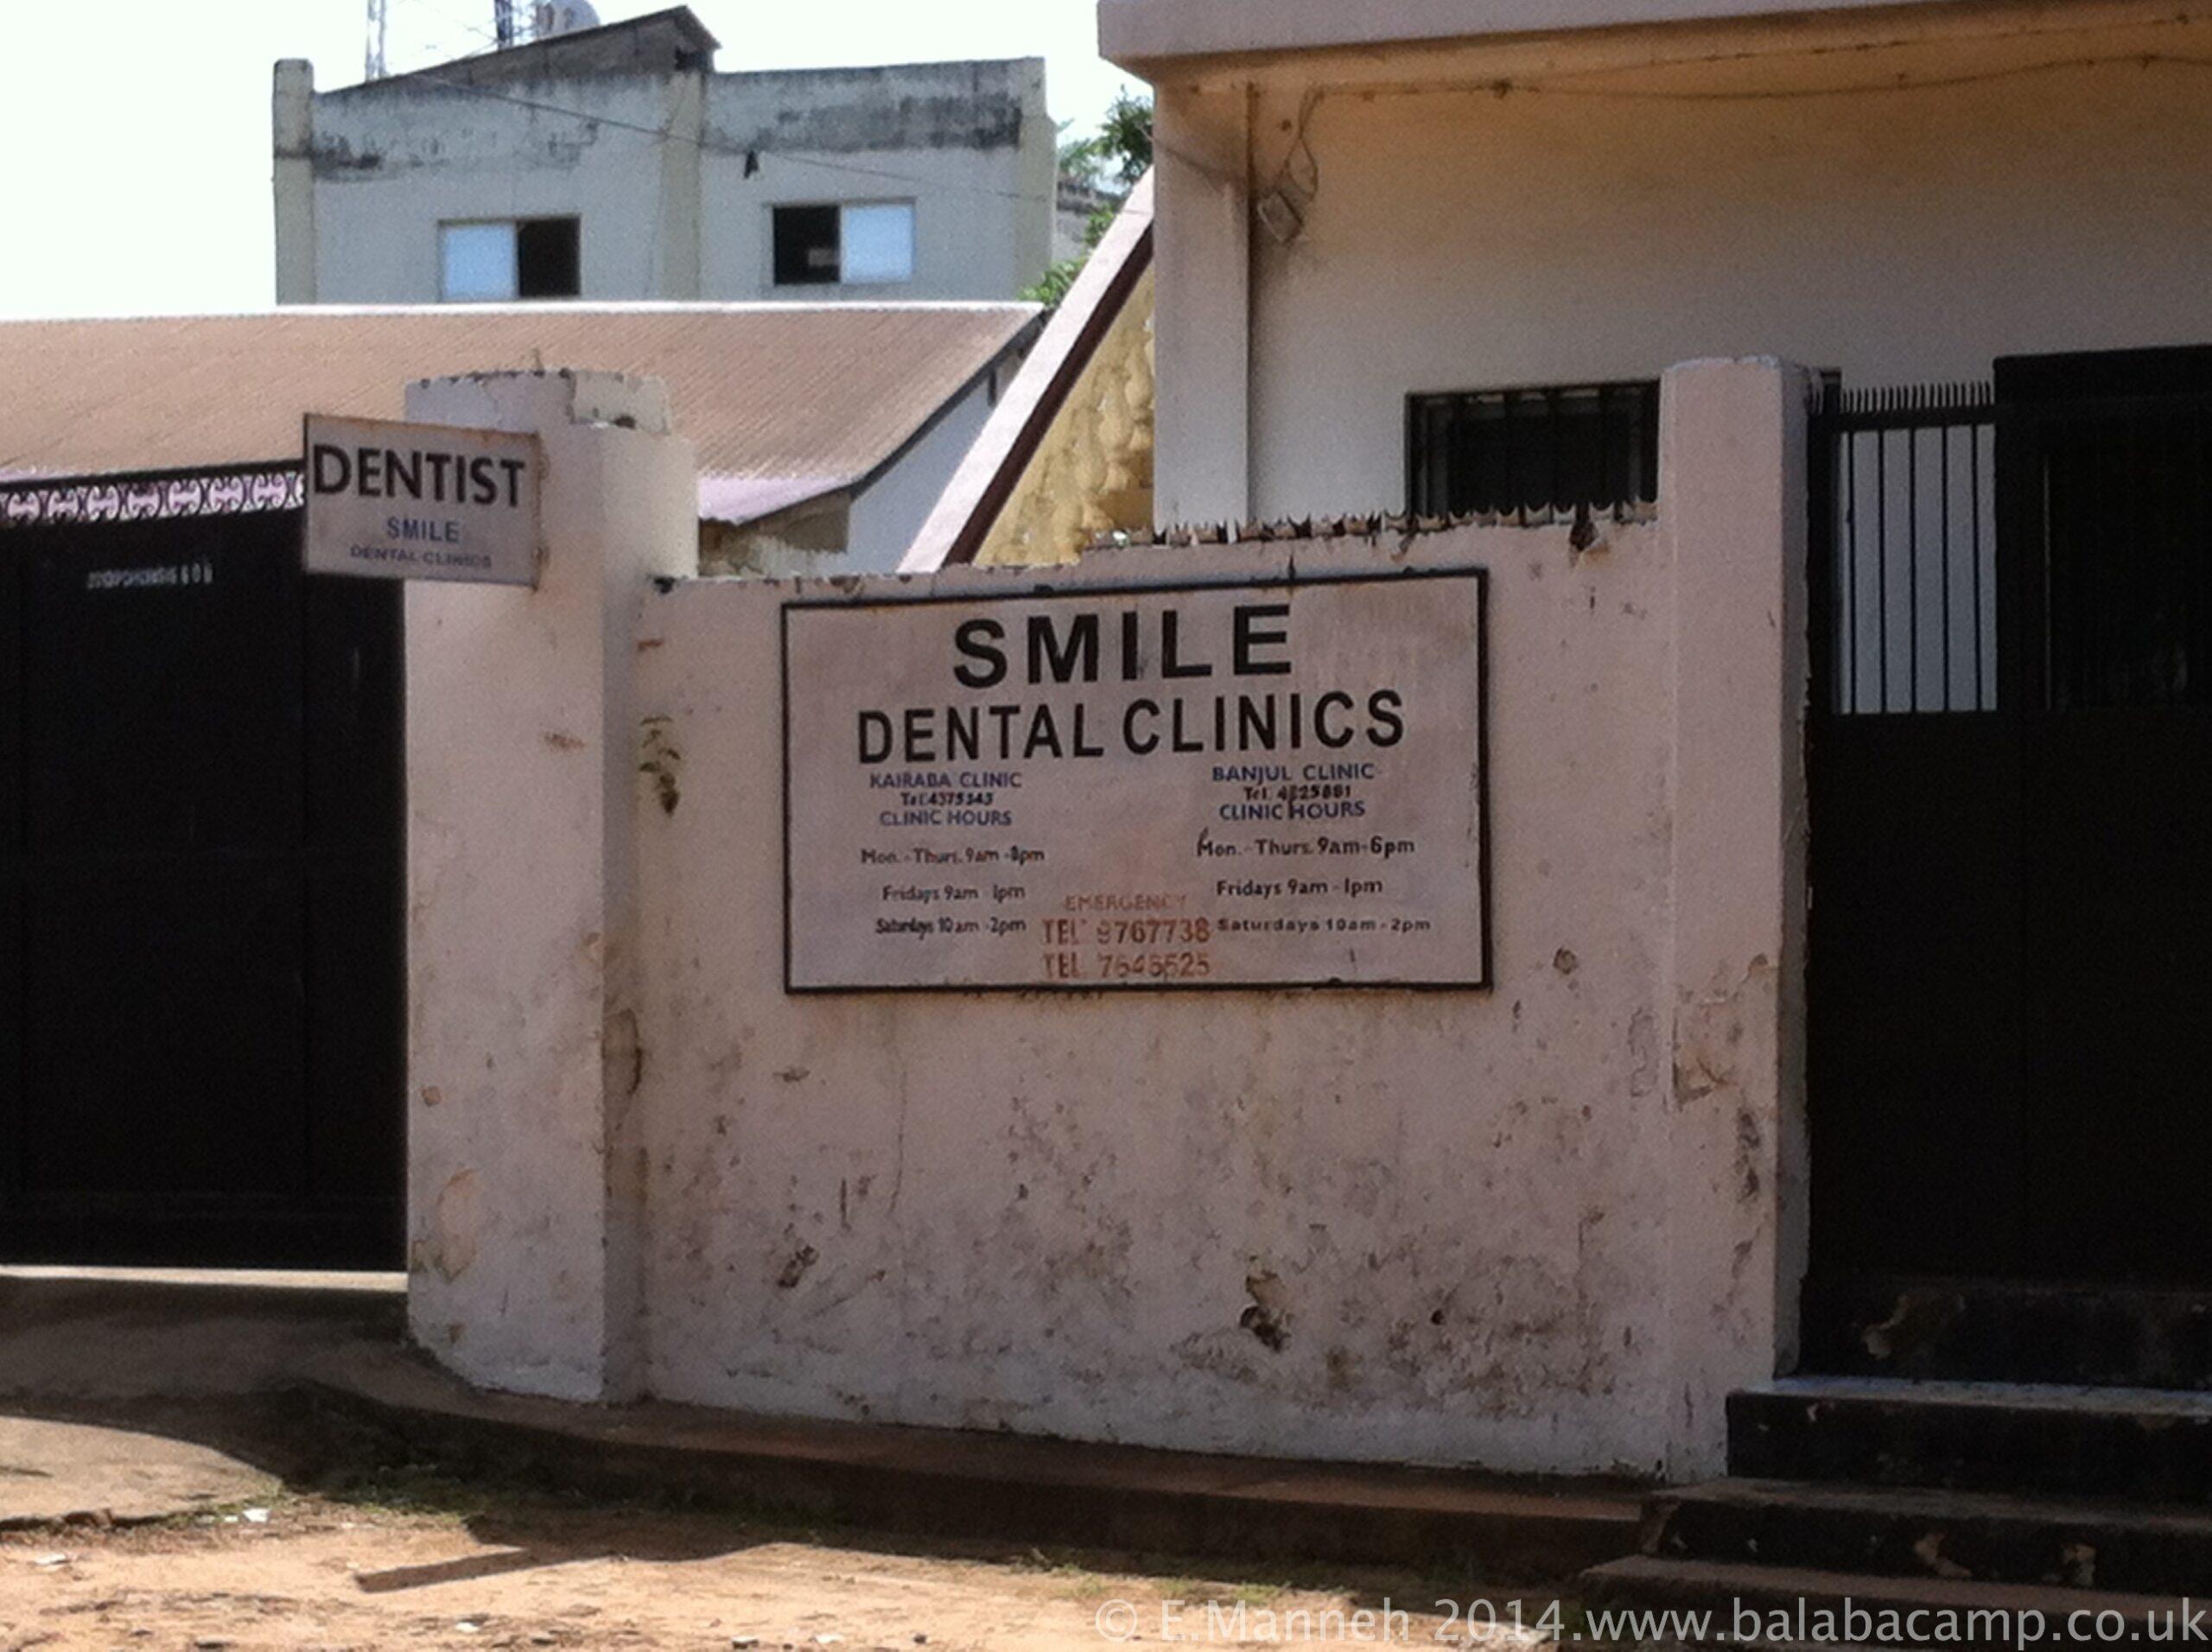 Smile Dental Clinics Gambia Ltd